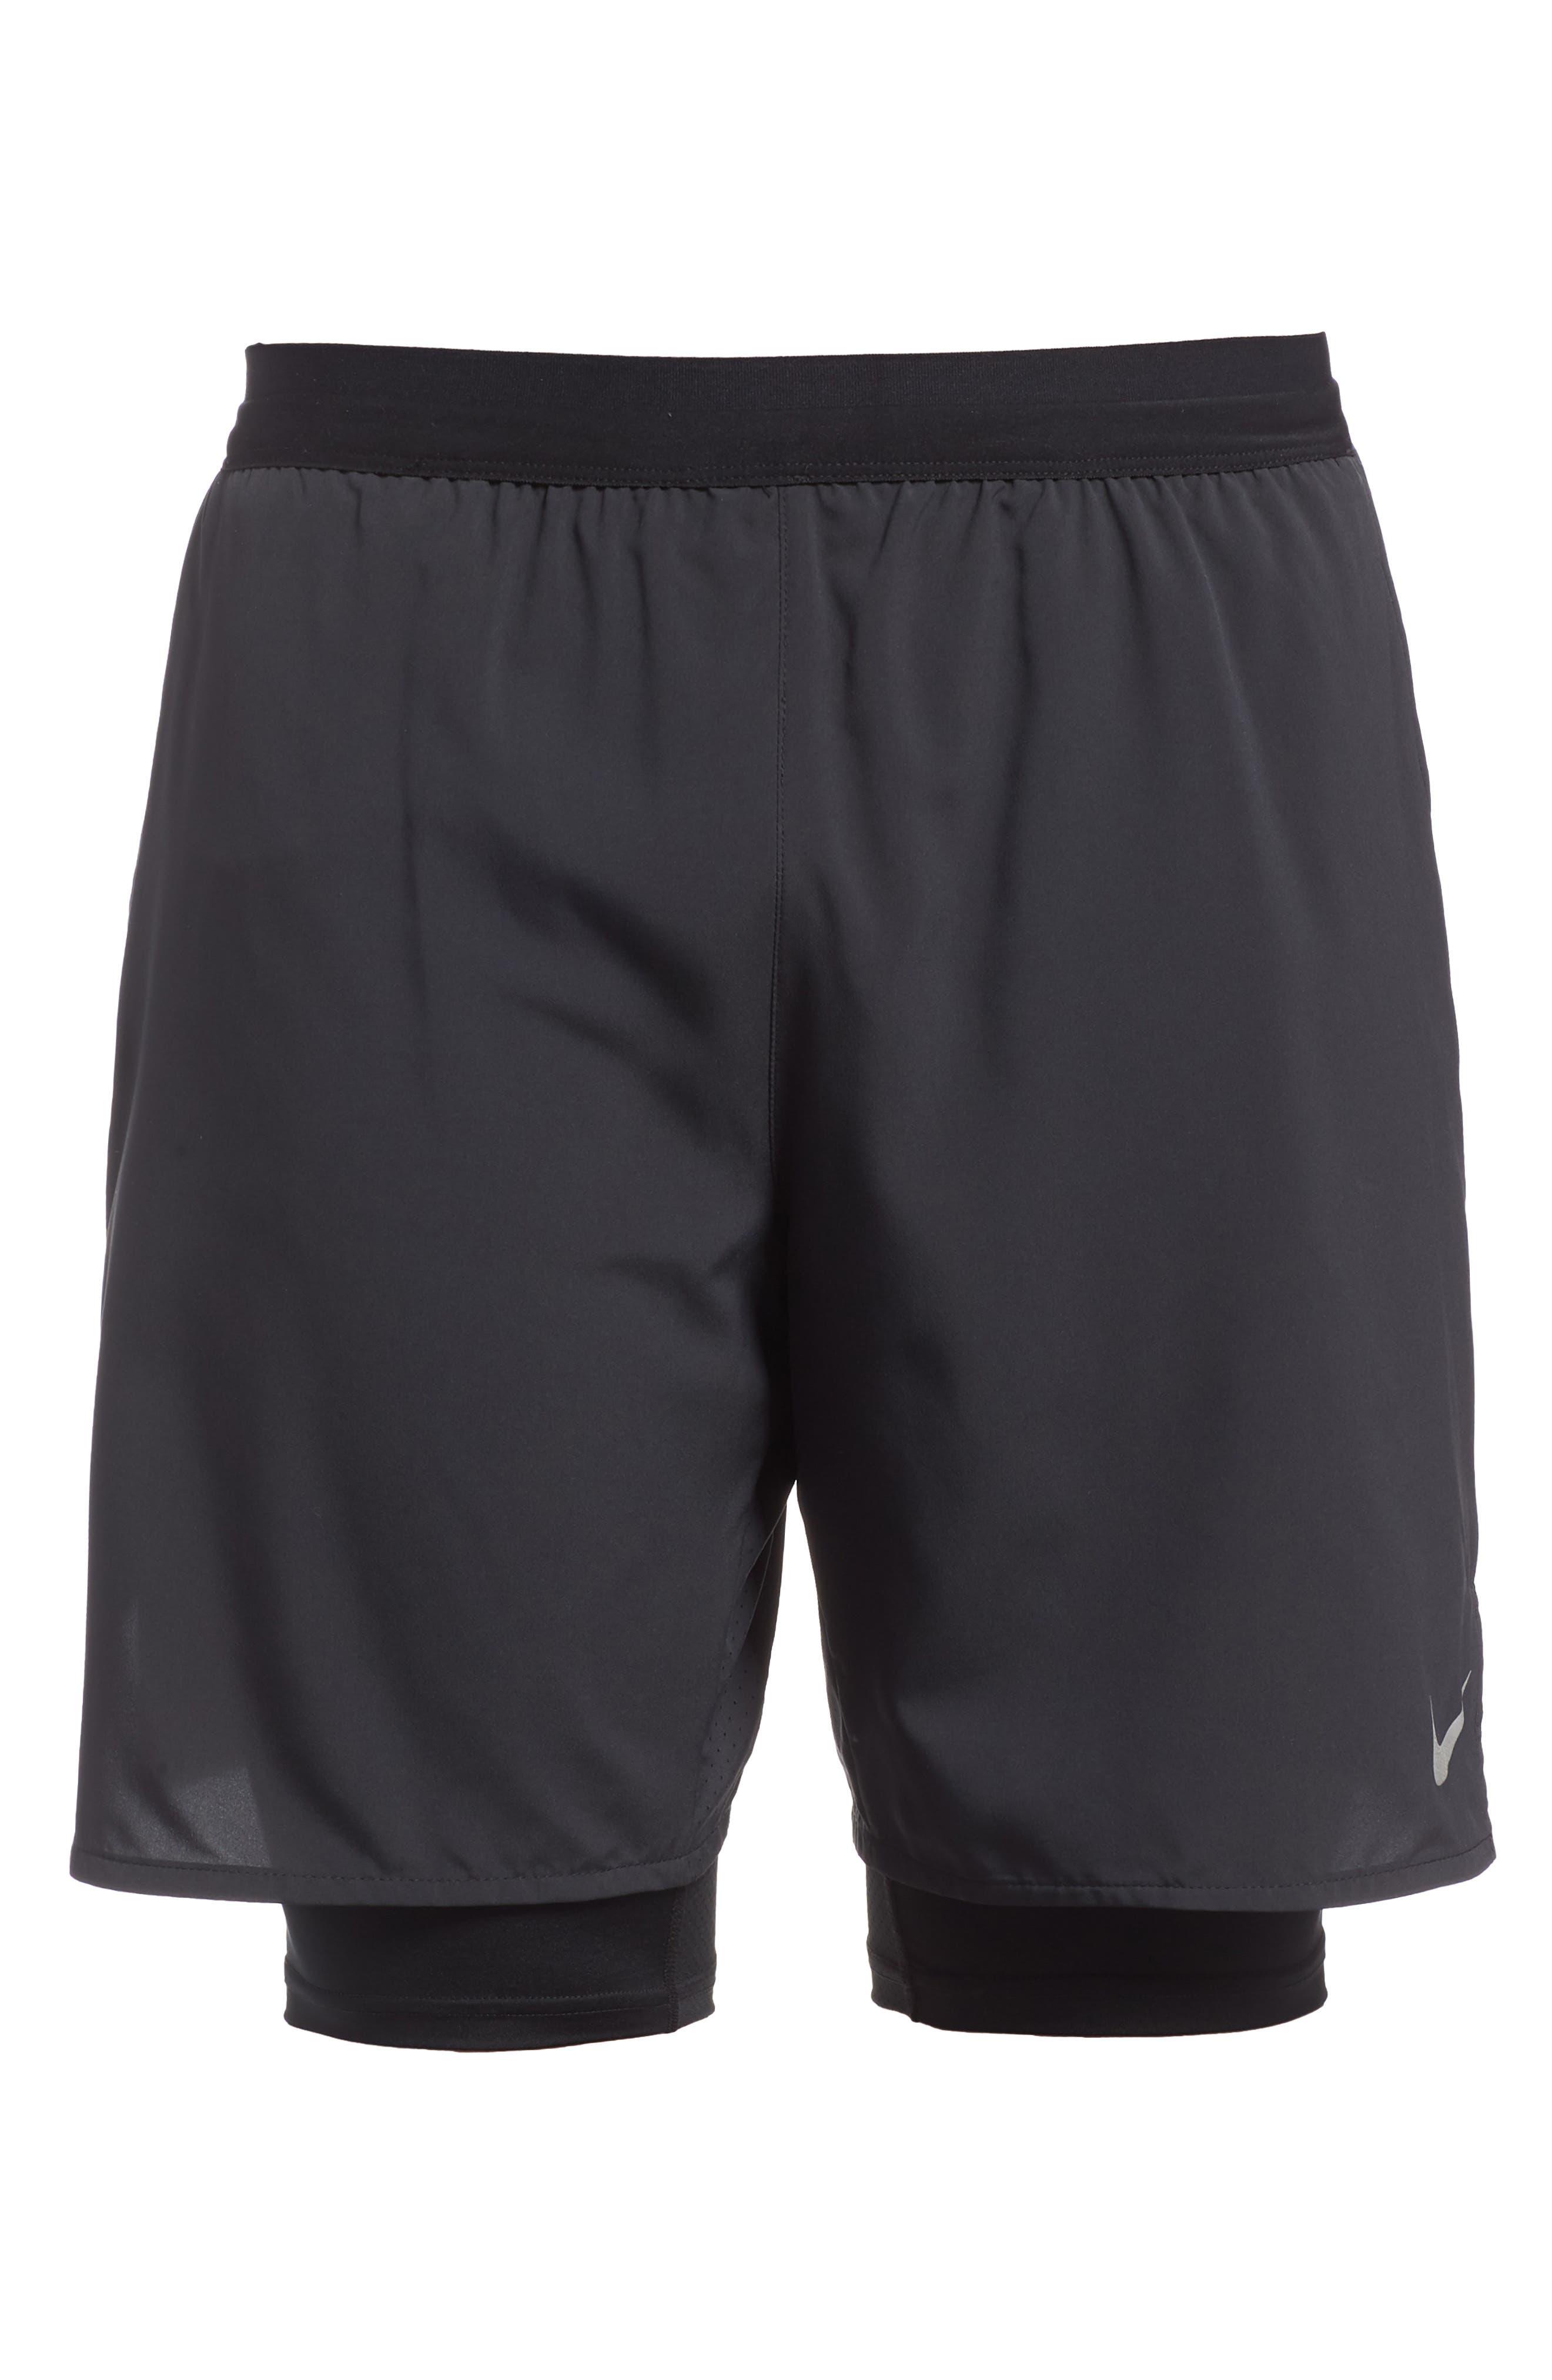 Flex Distance Running Shorts,                             Alternate thumbnail 6, color,                             Black/ Black